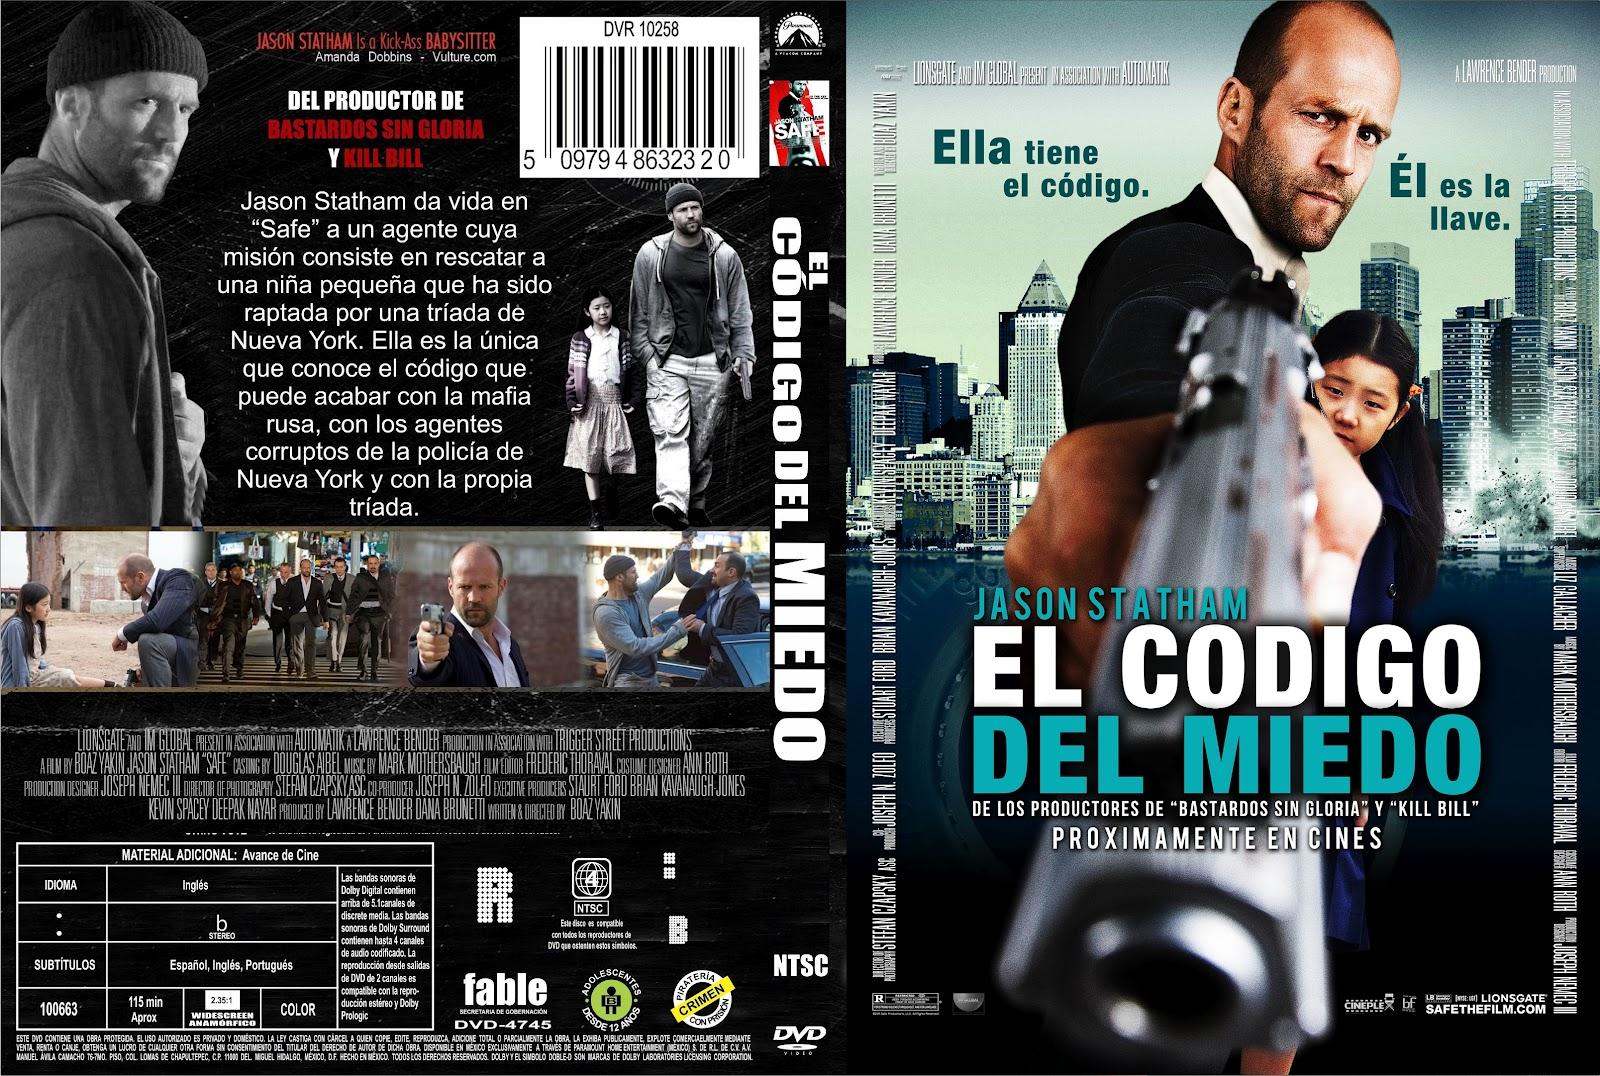 http://4.bp.blogspot.com/-DouEvHk3nAQ/UI6eTSqiP9I/AAAAAAAAATM/BBi0-e-CReQ/s1600/El+Codigo+Del+Miedo+Custom+Por+Fable+-+dvd.jpg